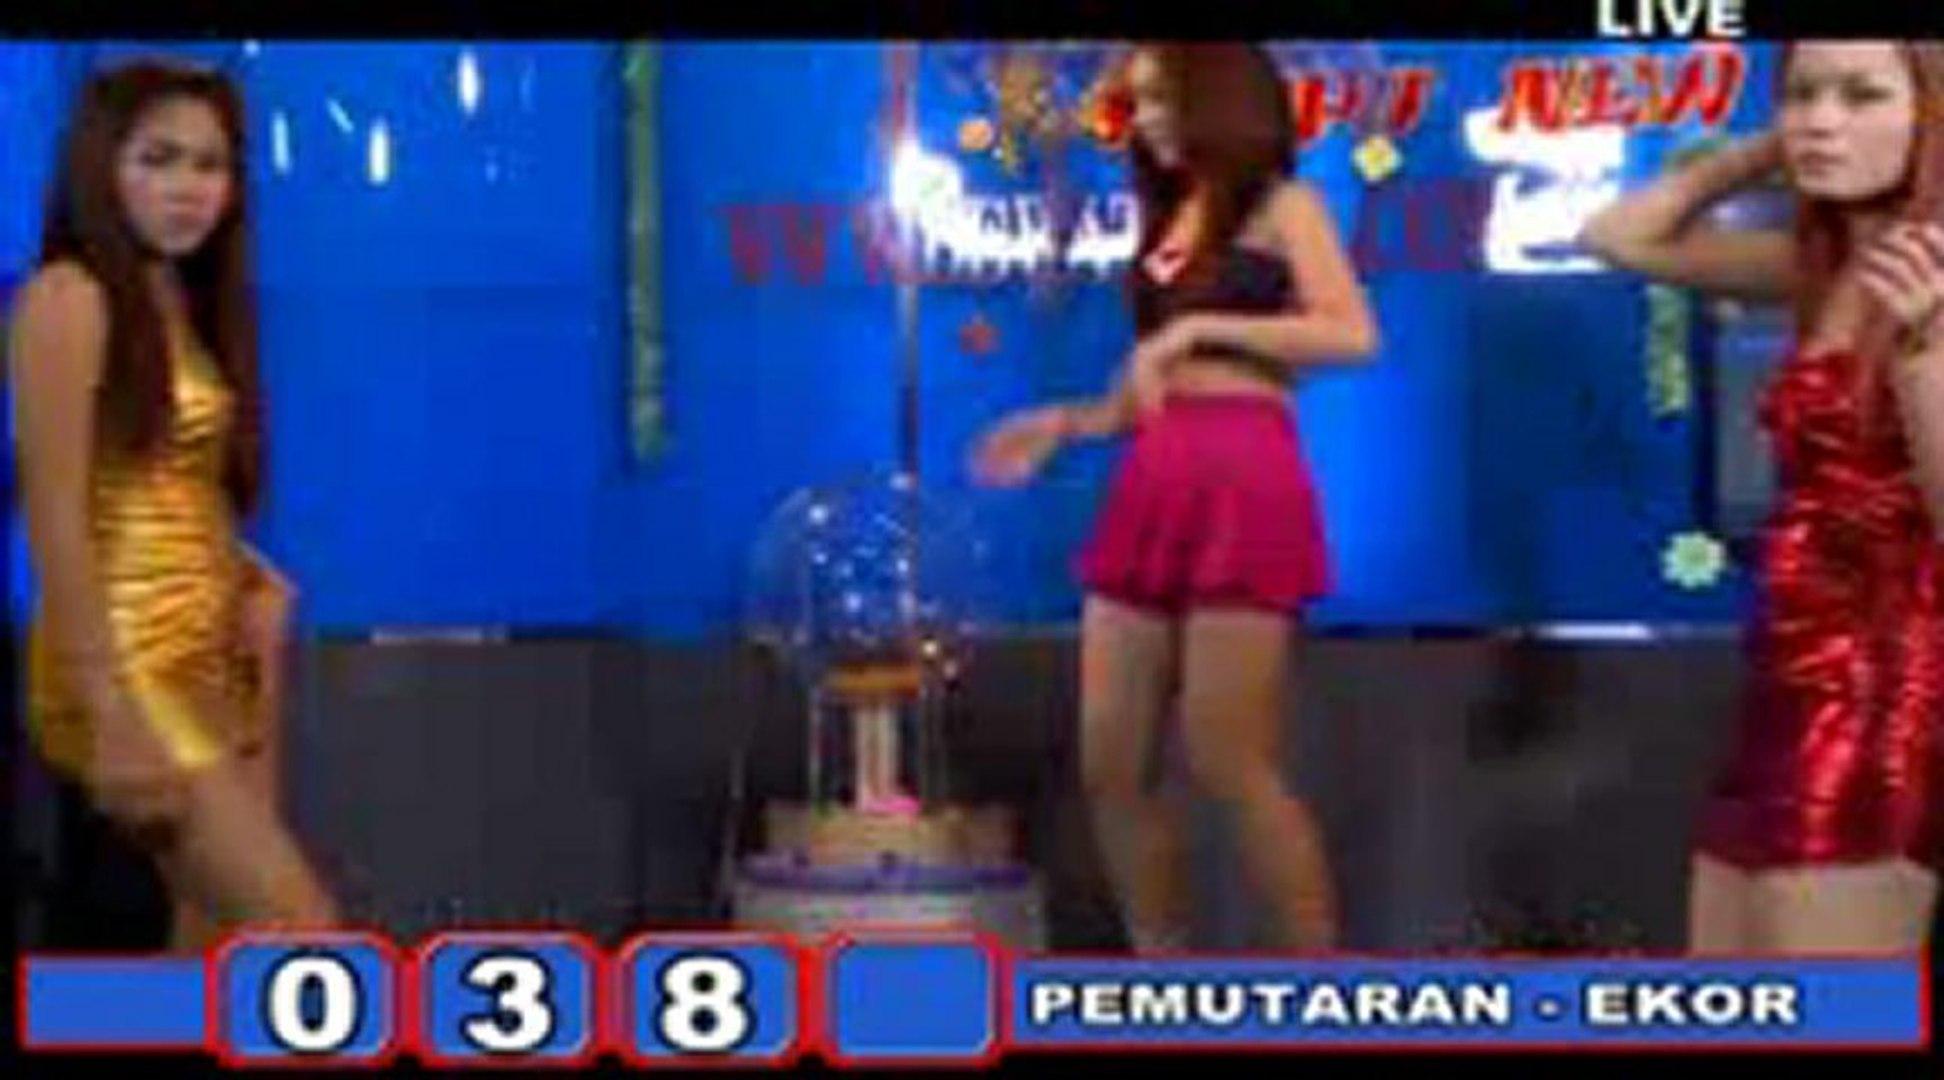 Undian Nomor Buntut DEWA TOGEL JAKARTA POOLS tgl 01 Januari 2013